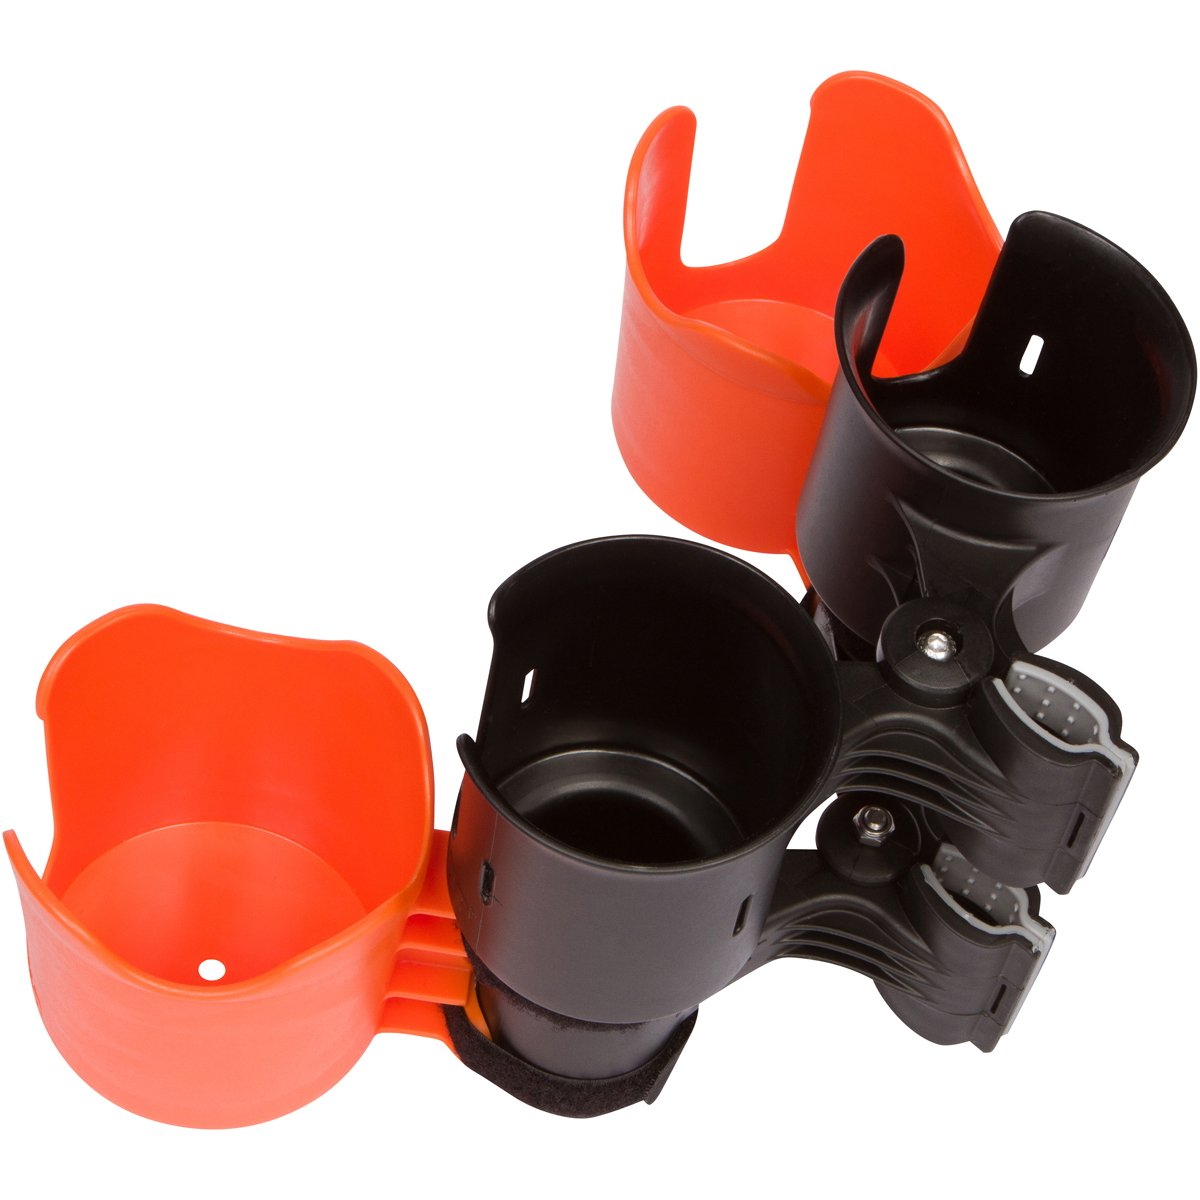 2 Orange RoboCup Pluses attached to Black RoboCup